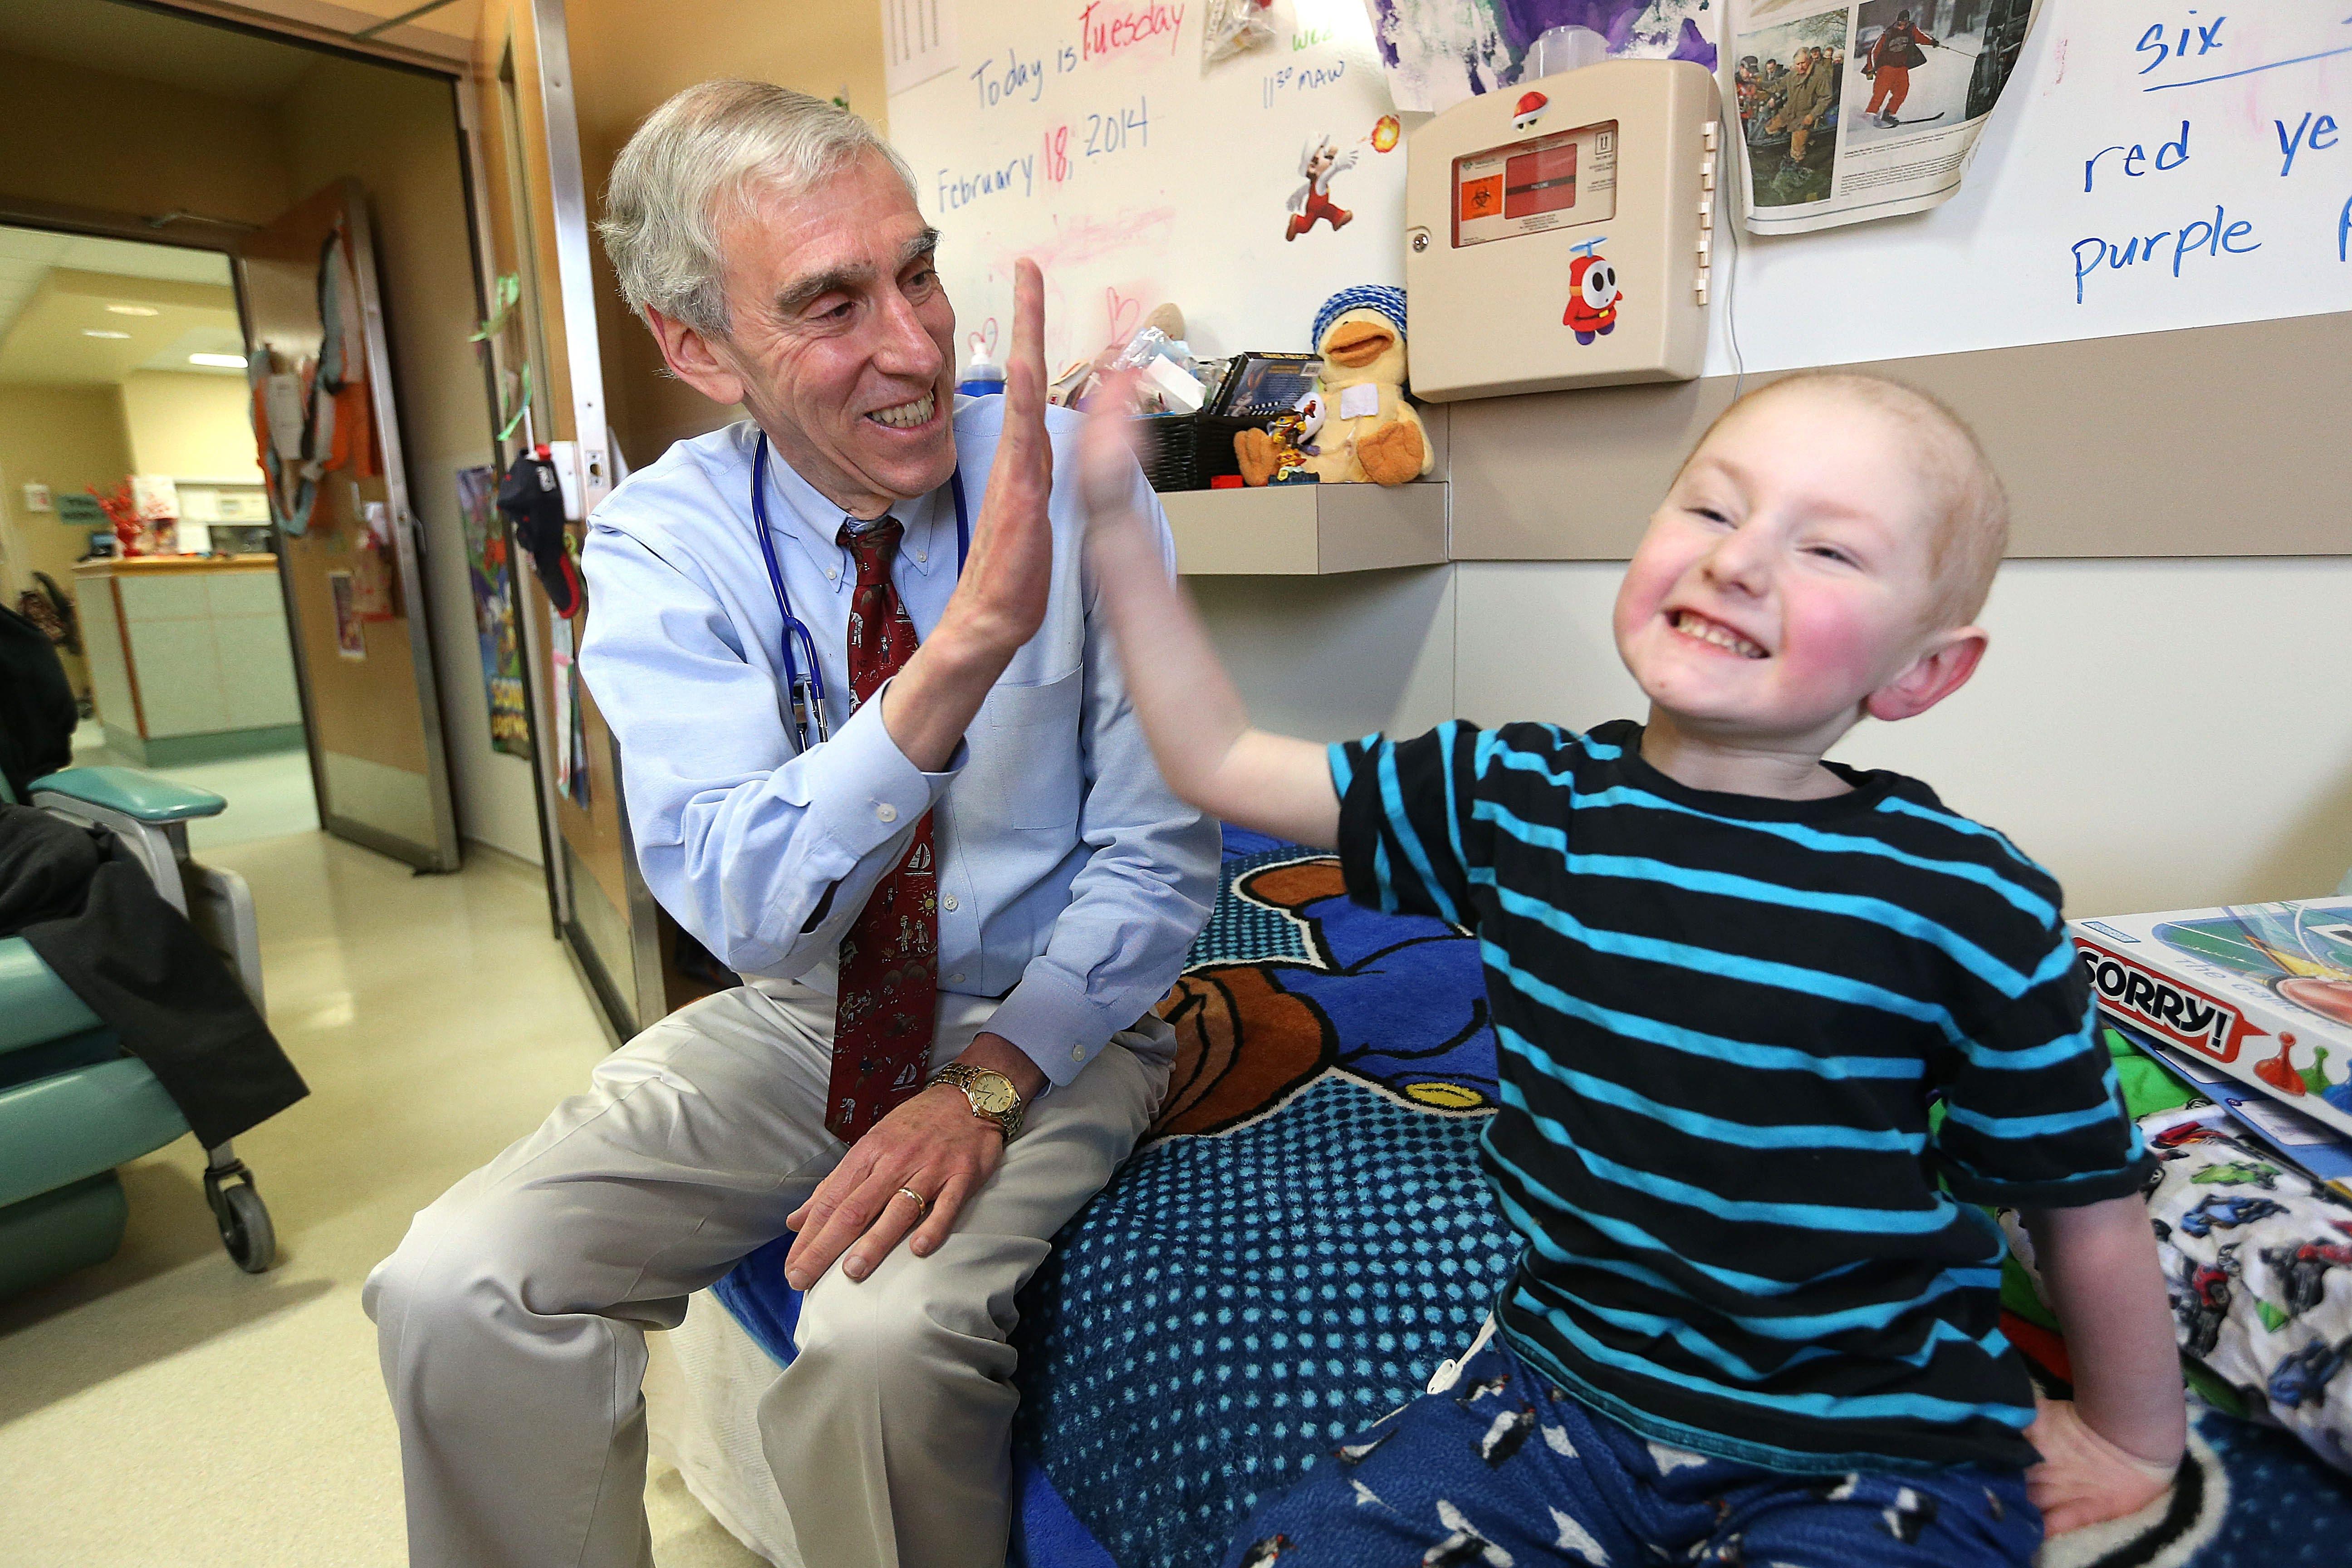 Dr. Martin Brecher and Leukemia patient Brett Struble, 5, of South Dayton, NY, at Roswell on Tuesday, Feb. 18, 2014.  (Robert Kirkham/Buffalo News)